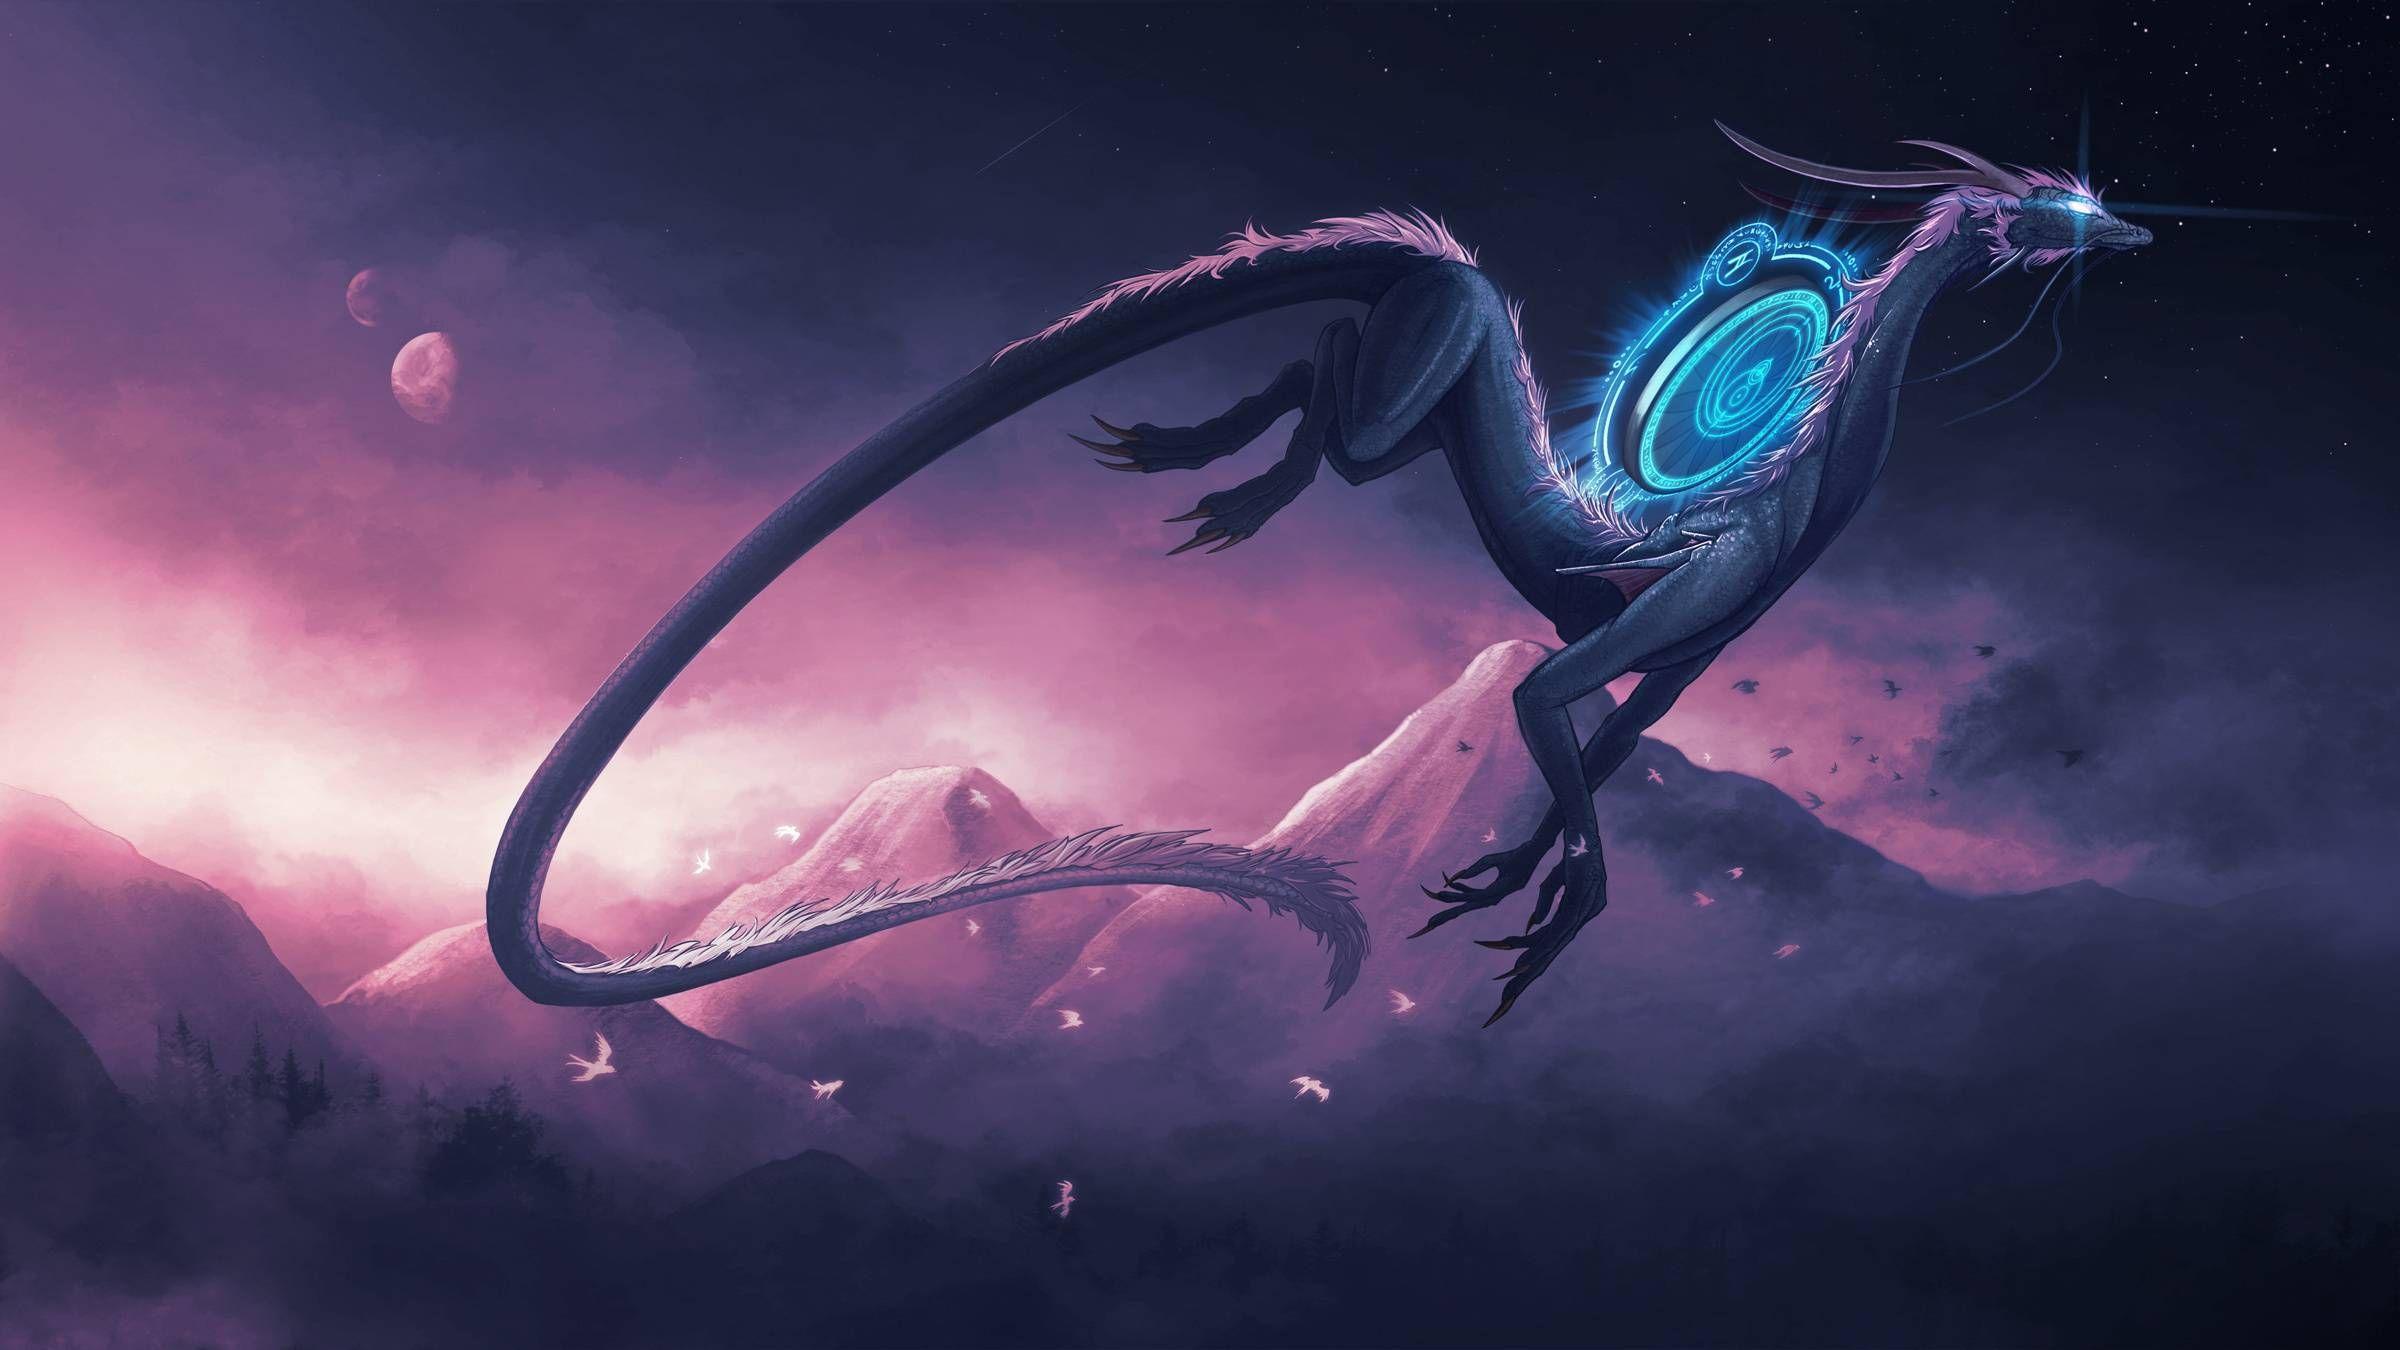 картинки фэнтези мистика драконы еще